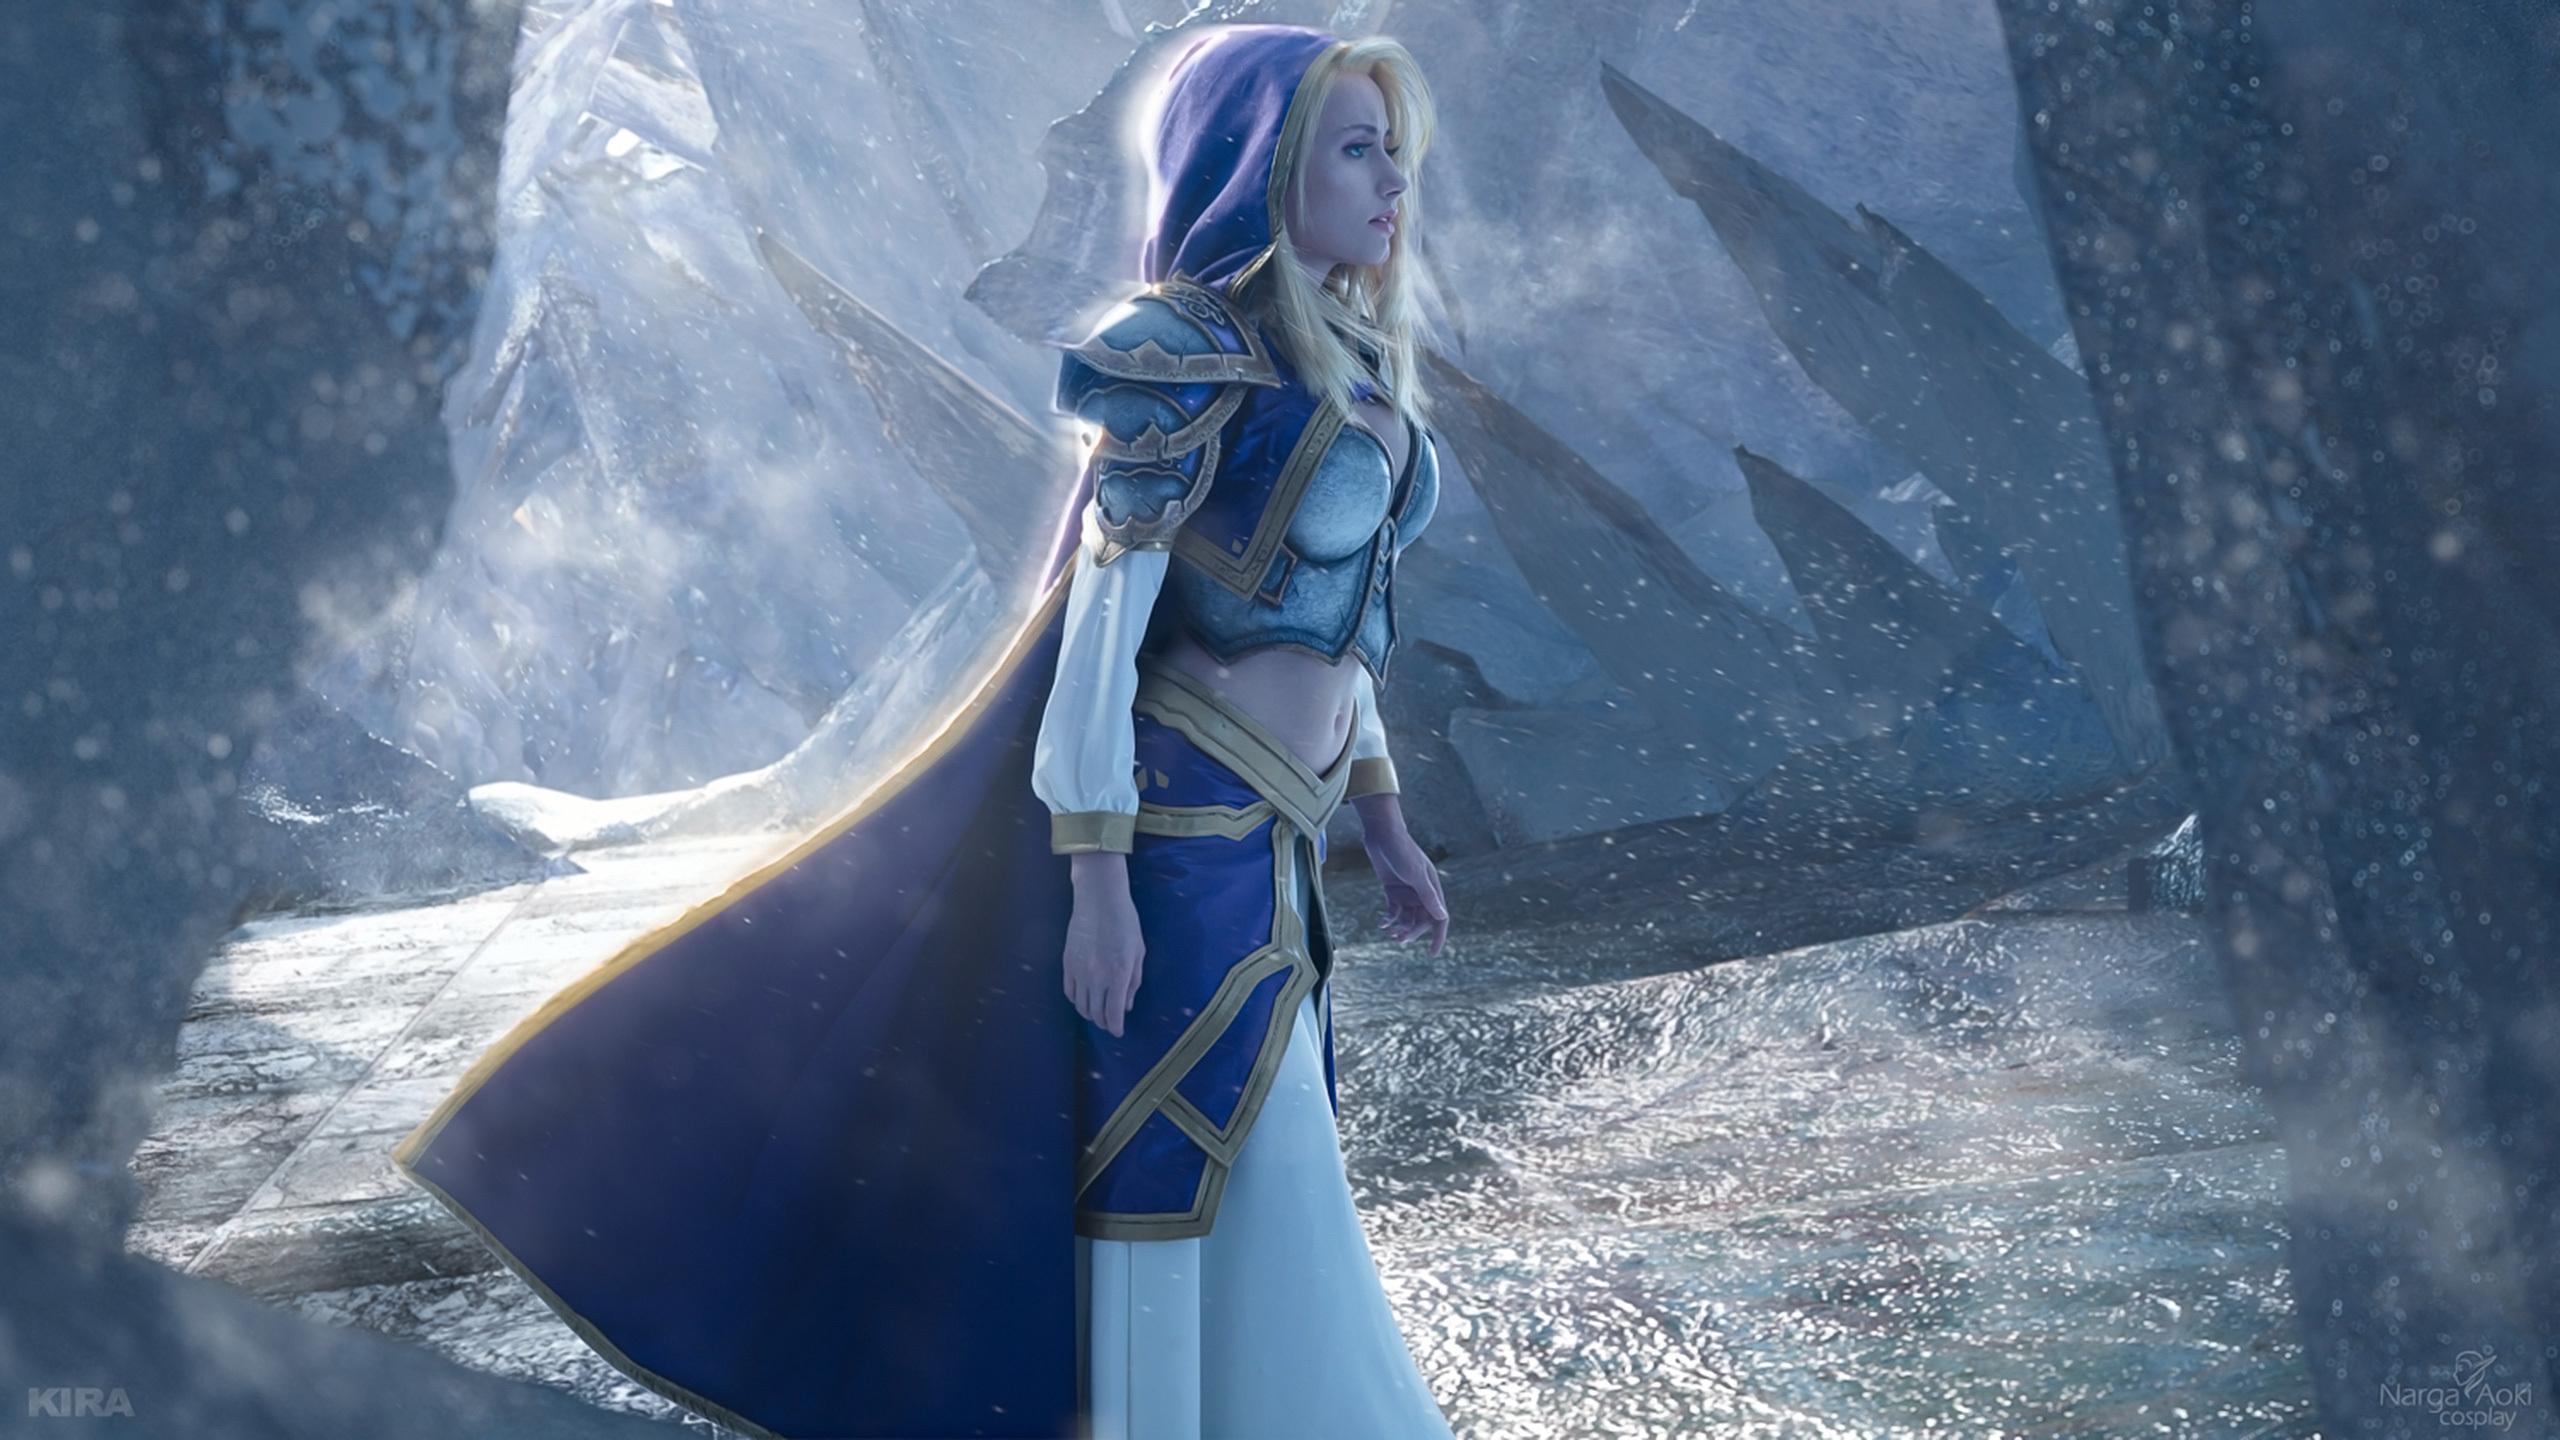 2560x1440 Jaina Proudmoore Warcraft 1440P Resolution HD 4k